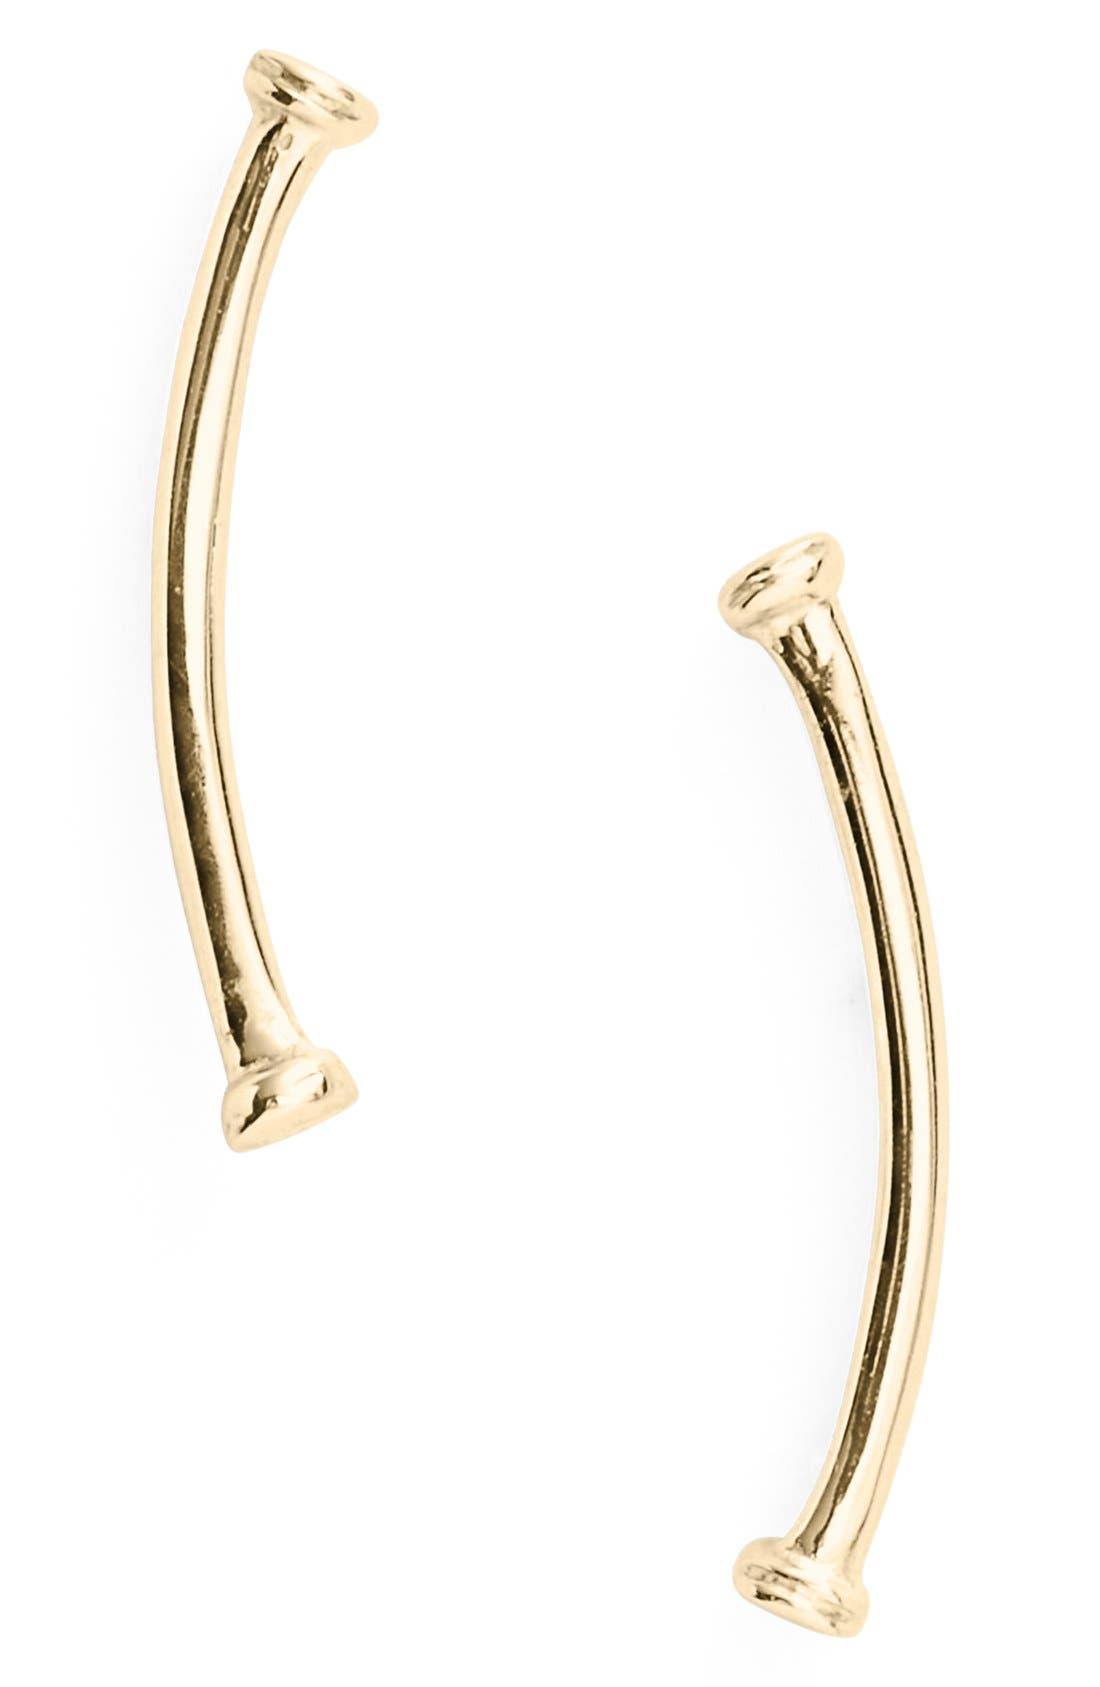 Alternate Image 1 Selected - Bony Levy Skinny Curve Bar Stud Earrings (Nordstrom Exclusive)